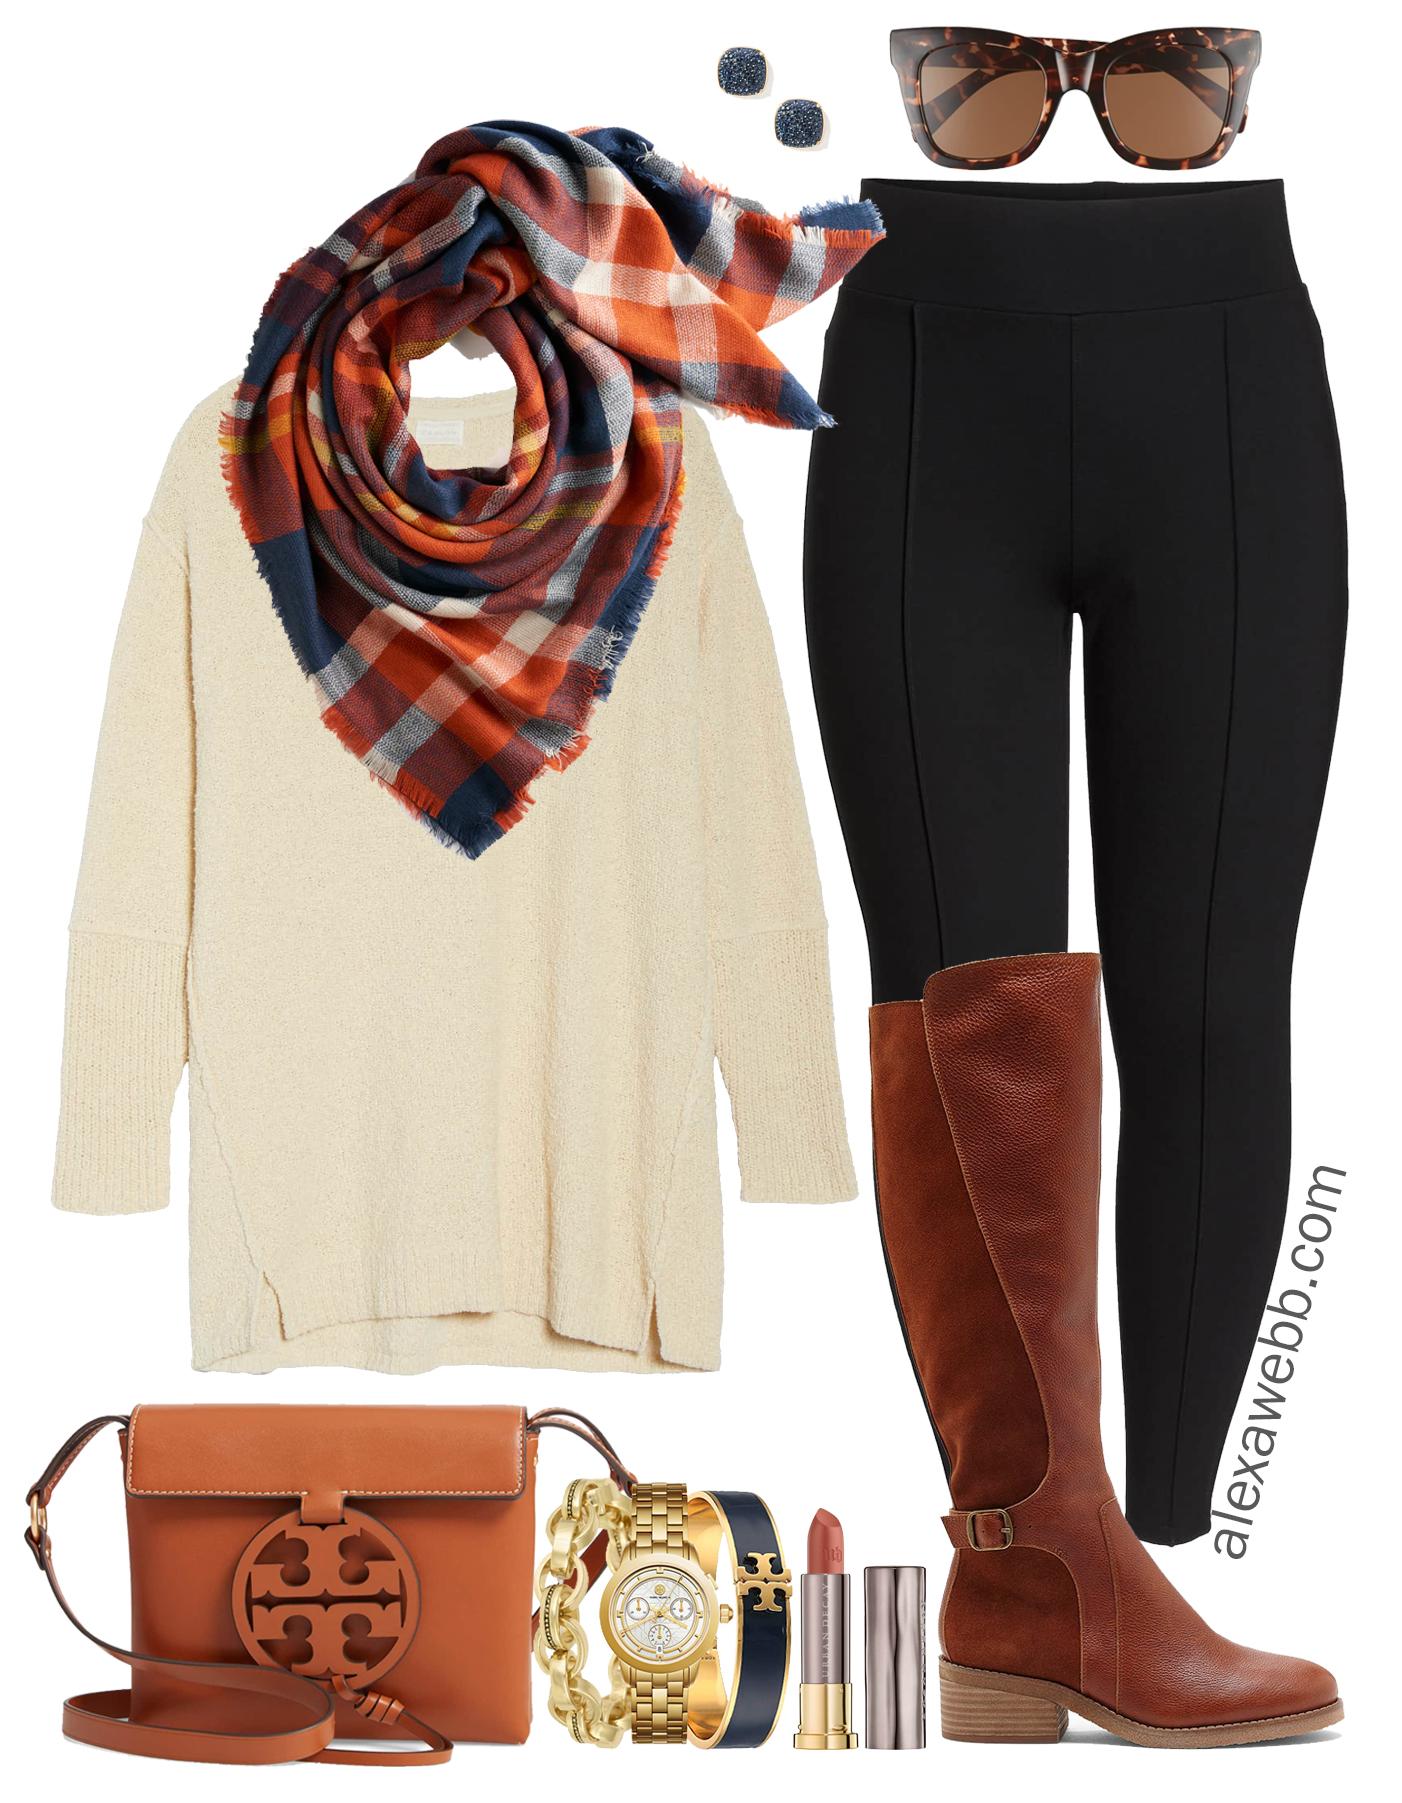 Plus Size Thanksgiving Outfits - Part 6 - Alexa Webb